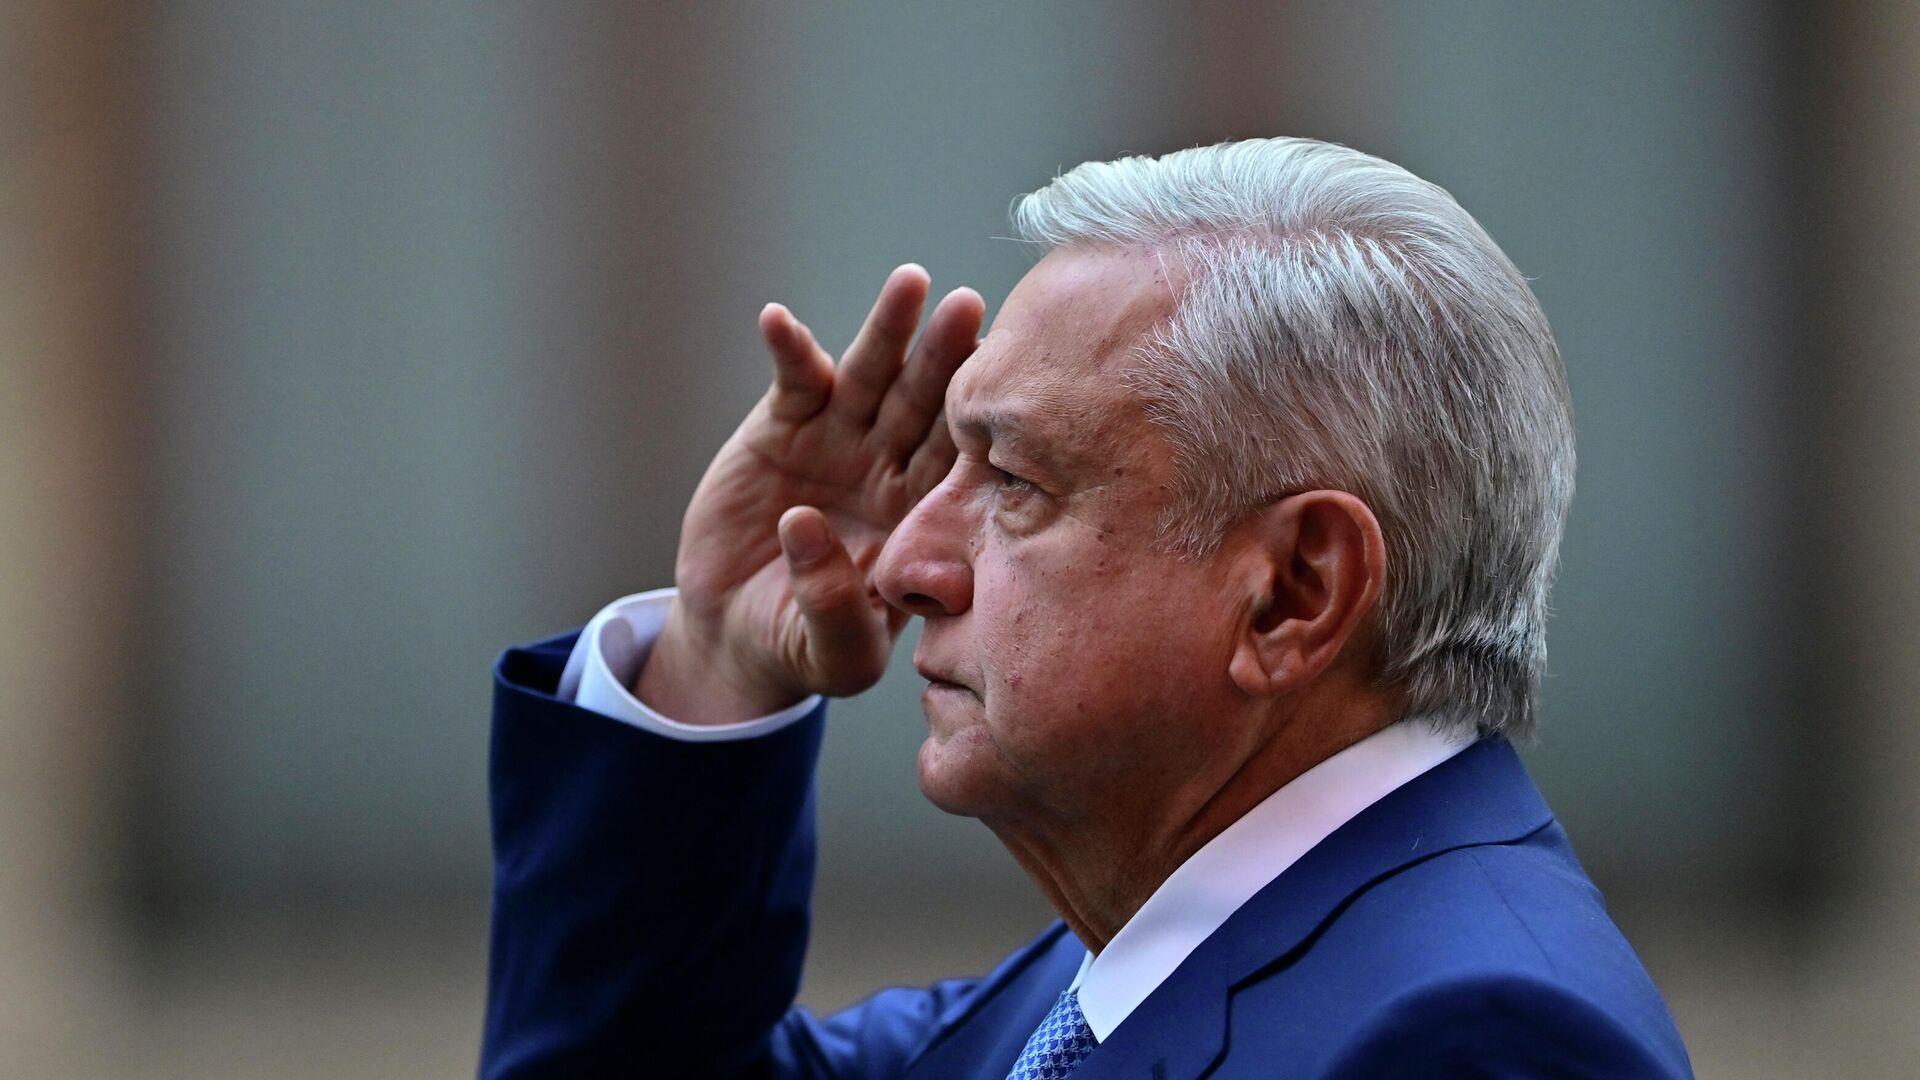 Andrés Manuel López Obrador, el presidente de México - Sputnik Mundo, 1920, 27.08.2021